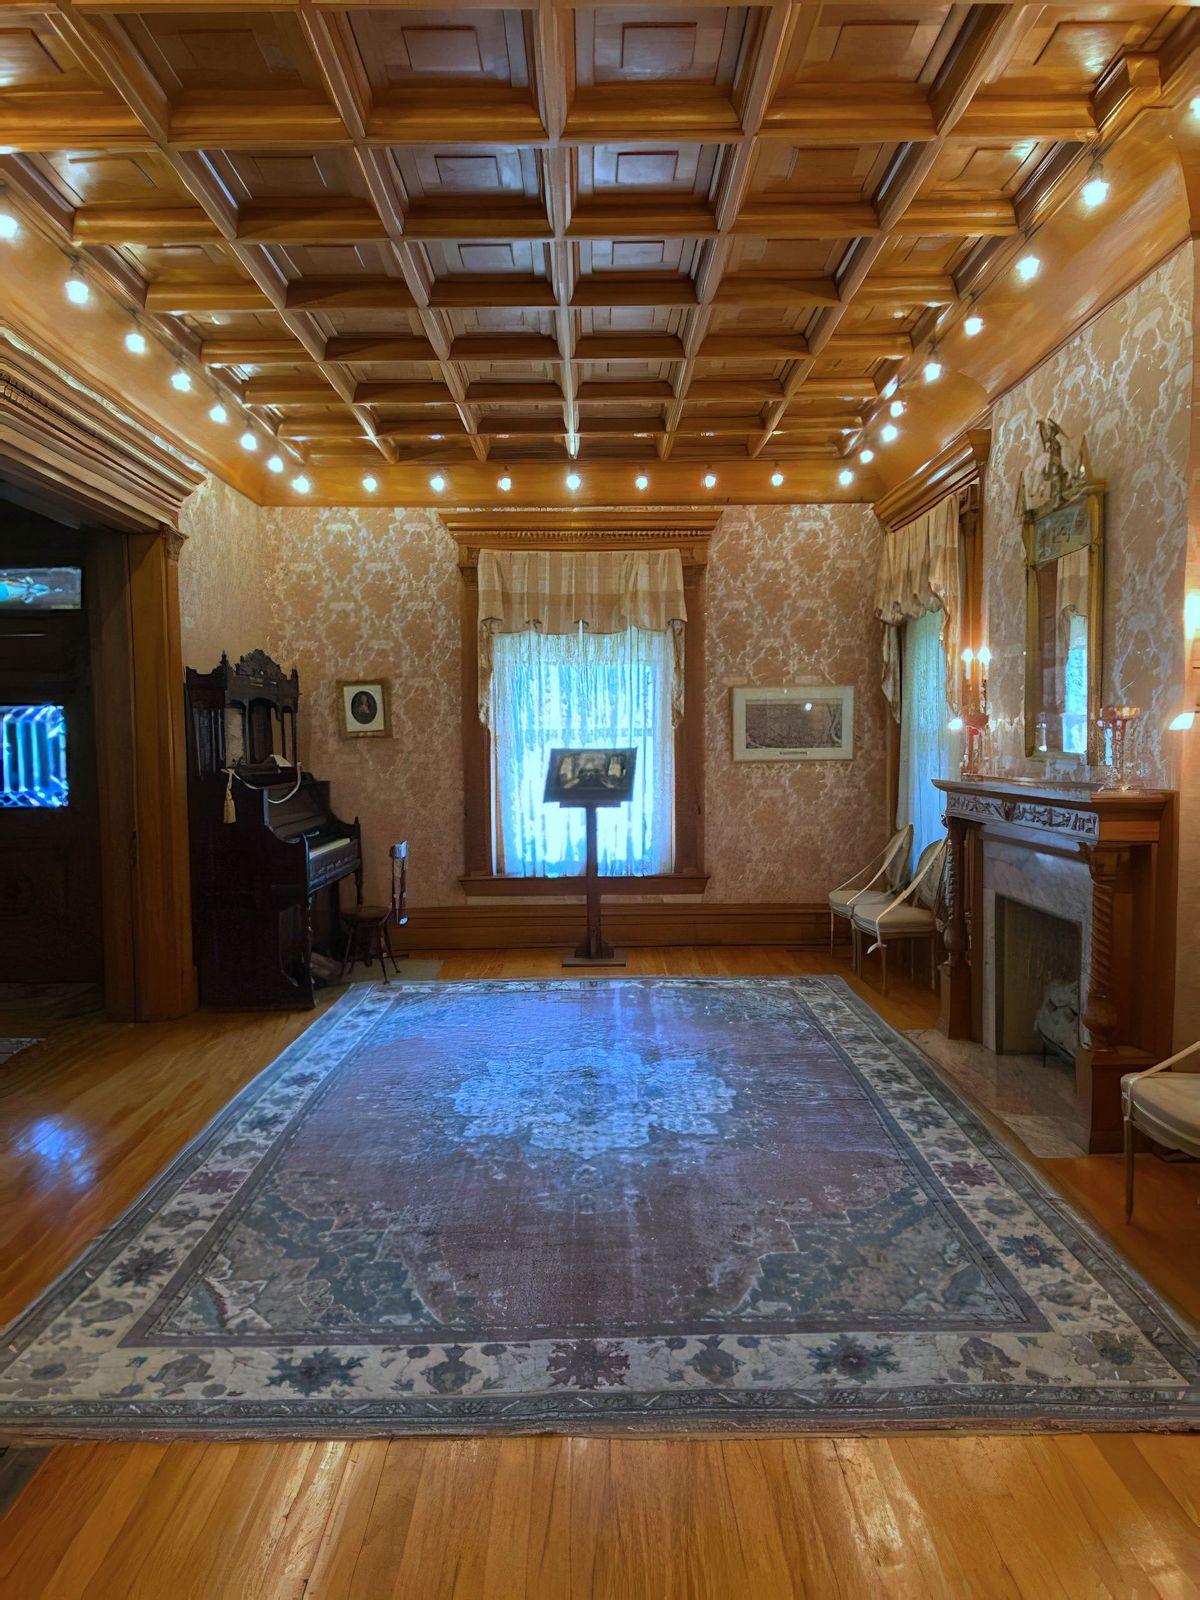 McFarland Historical Home Photo Video Shoot Location Dallas 03.jpg